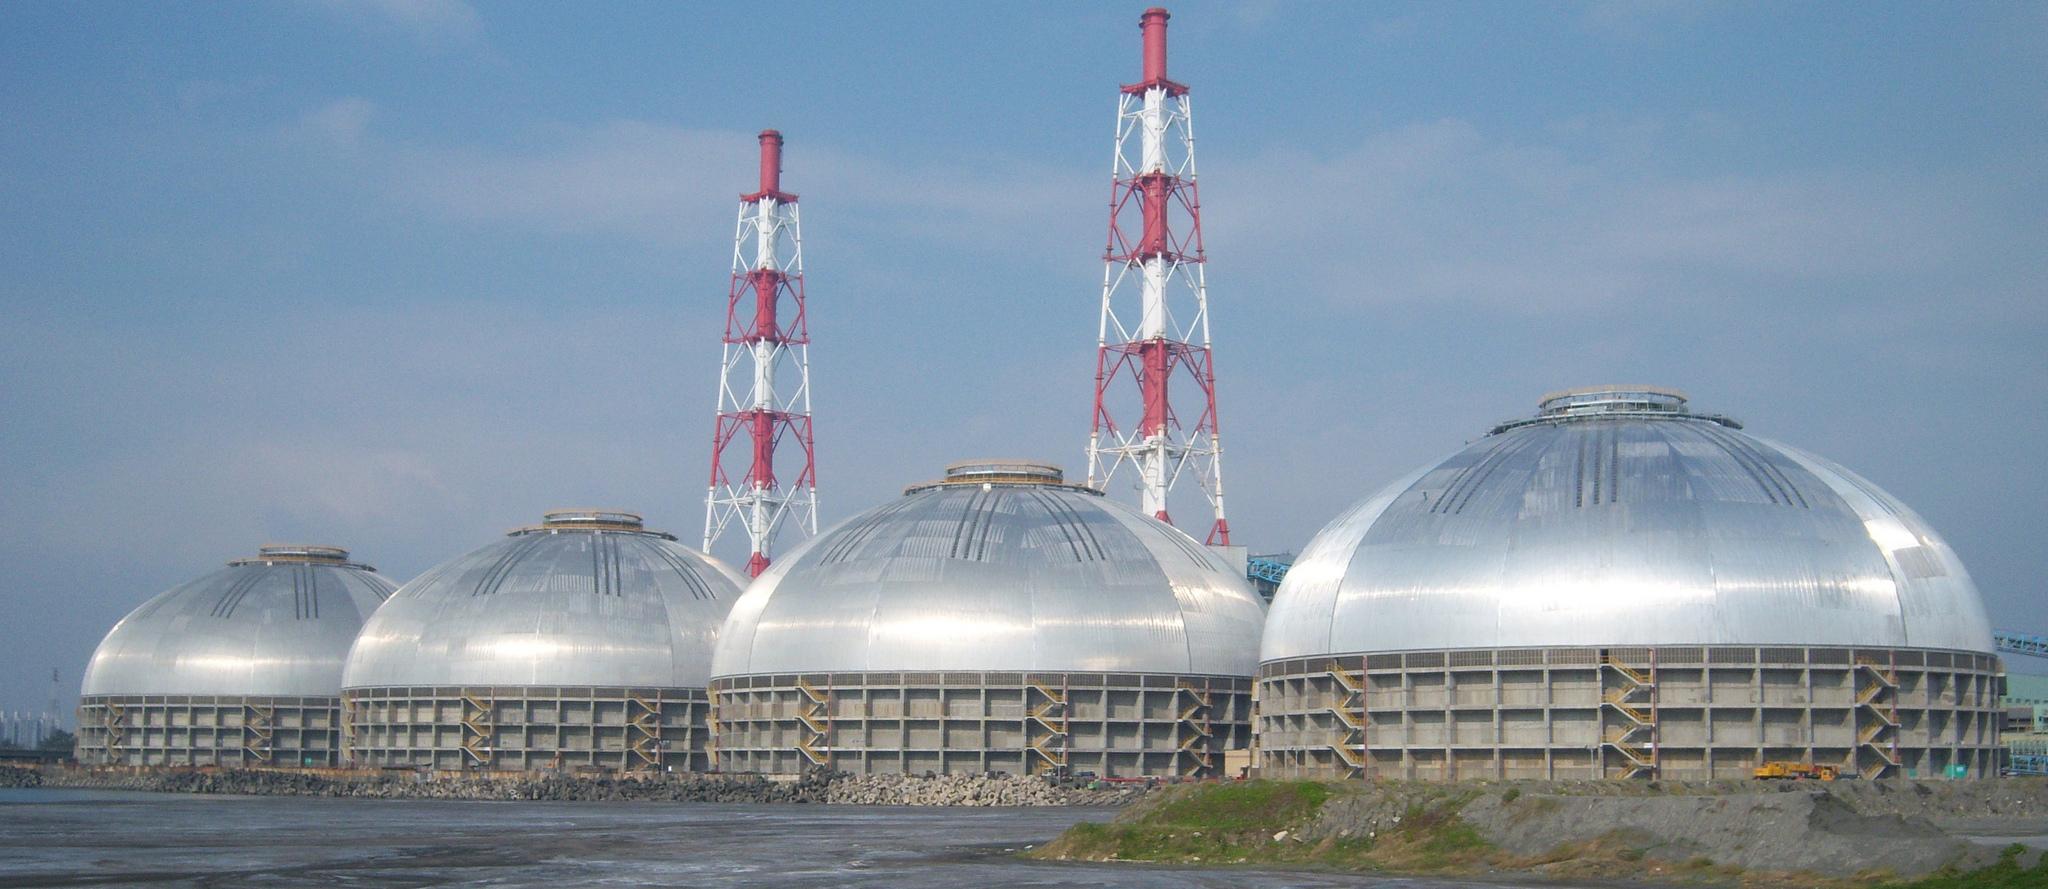 Tai Power, 4 x 126m coal storage domes, Taiwan